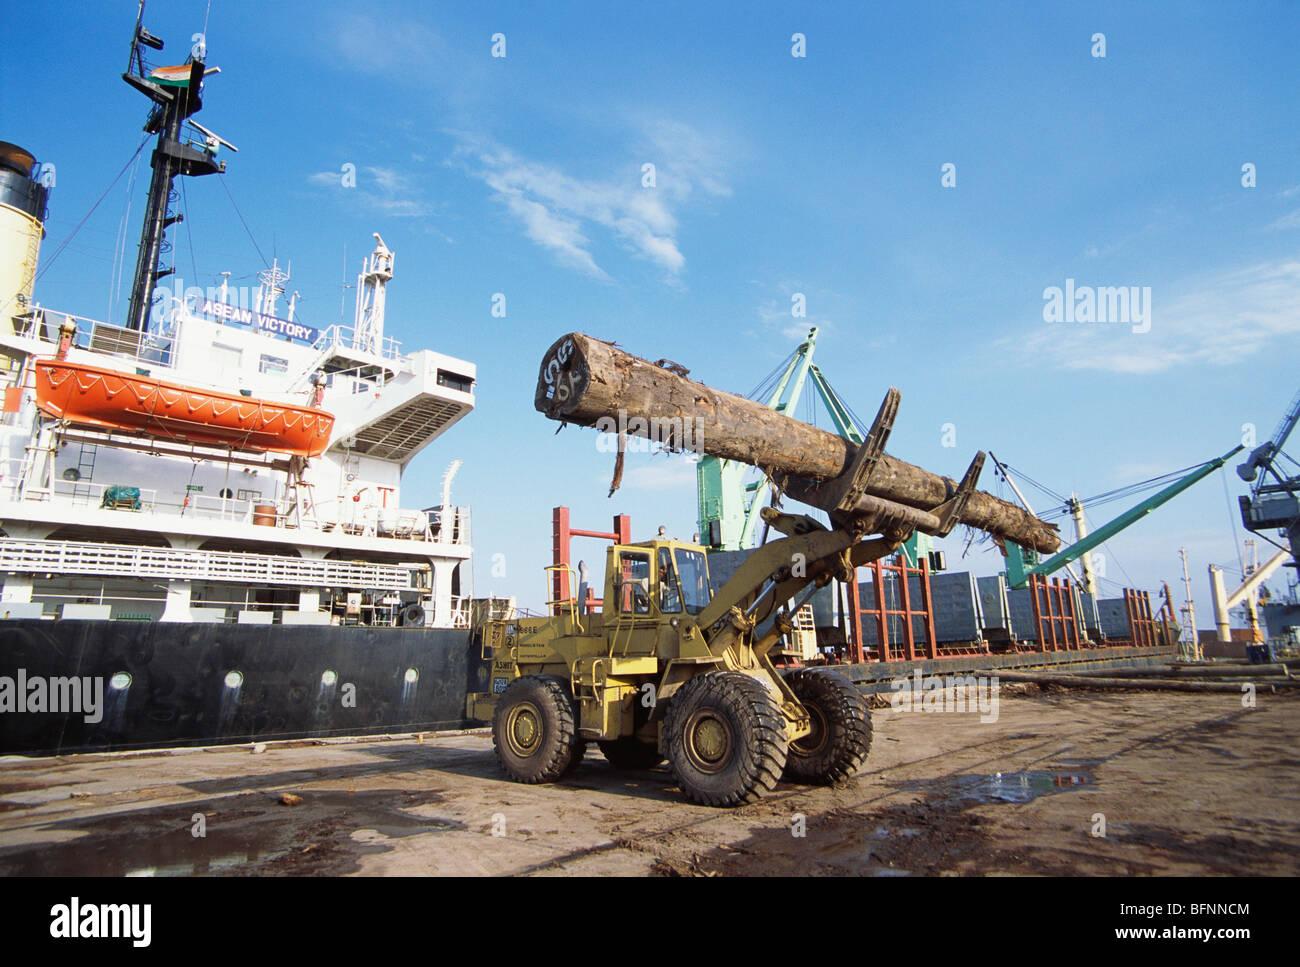 HMA 62589: Einfuhr von Holz-Holz; Kandla Port; Kutch; Gujarat; Indien Stockbild